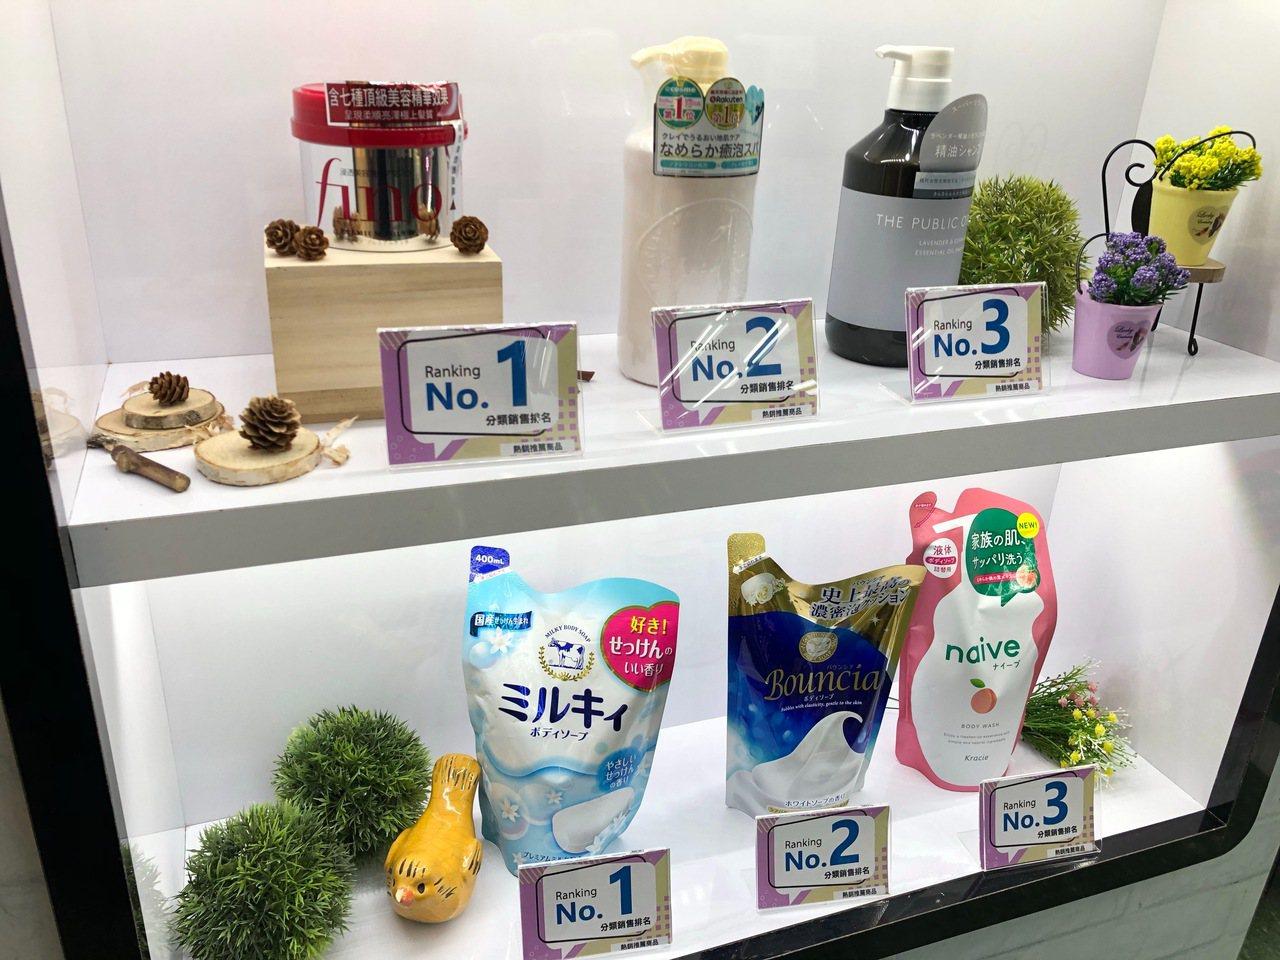 Tomod's台北ATT 4 FUN門市設置銷售排行專區,同步日本門市銷售排行,...